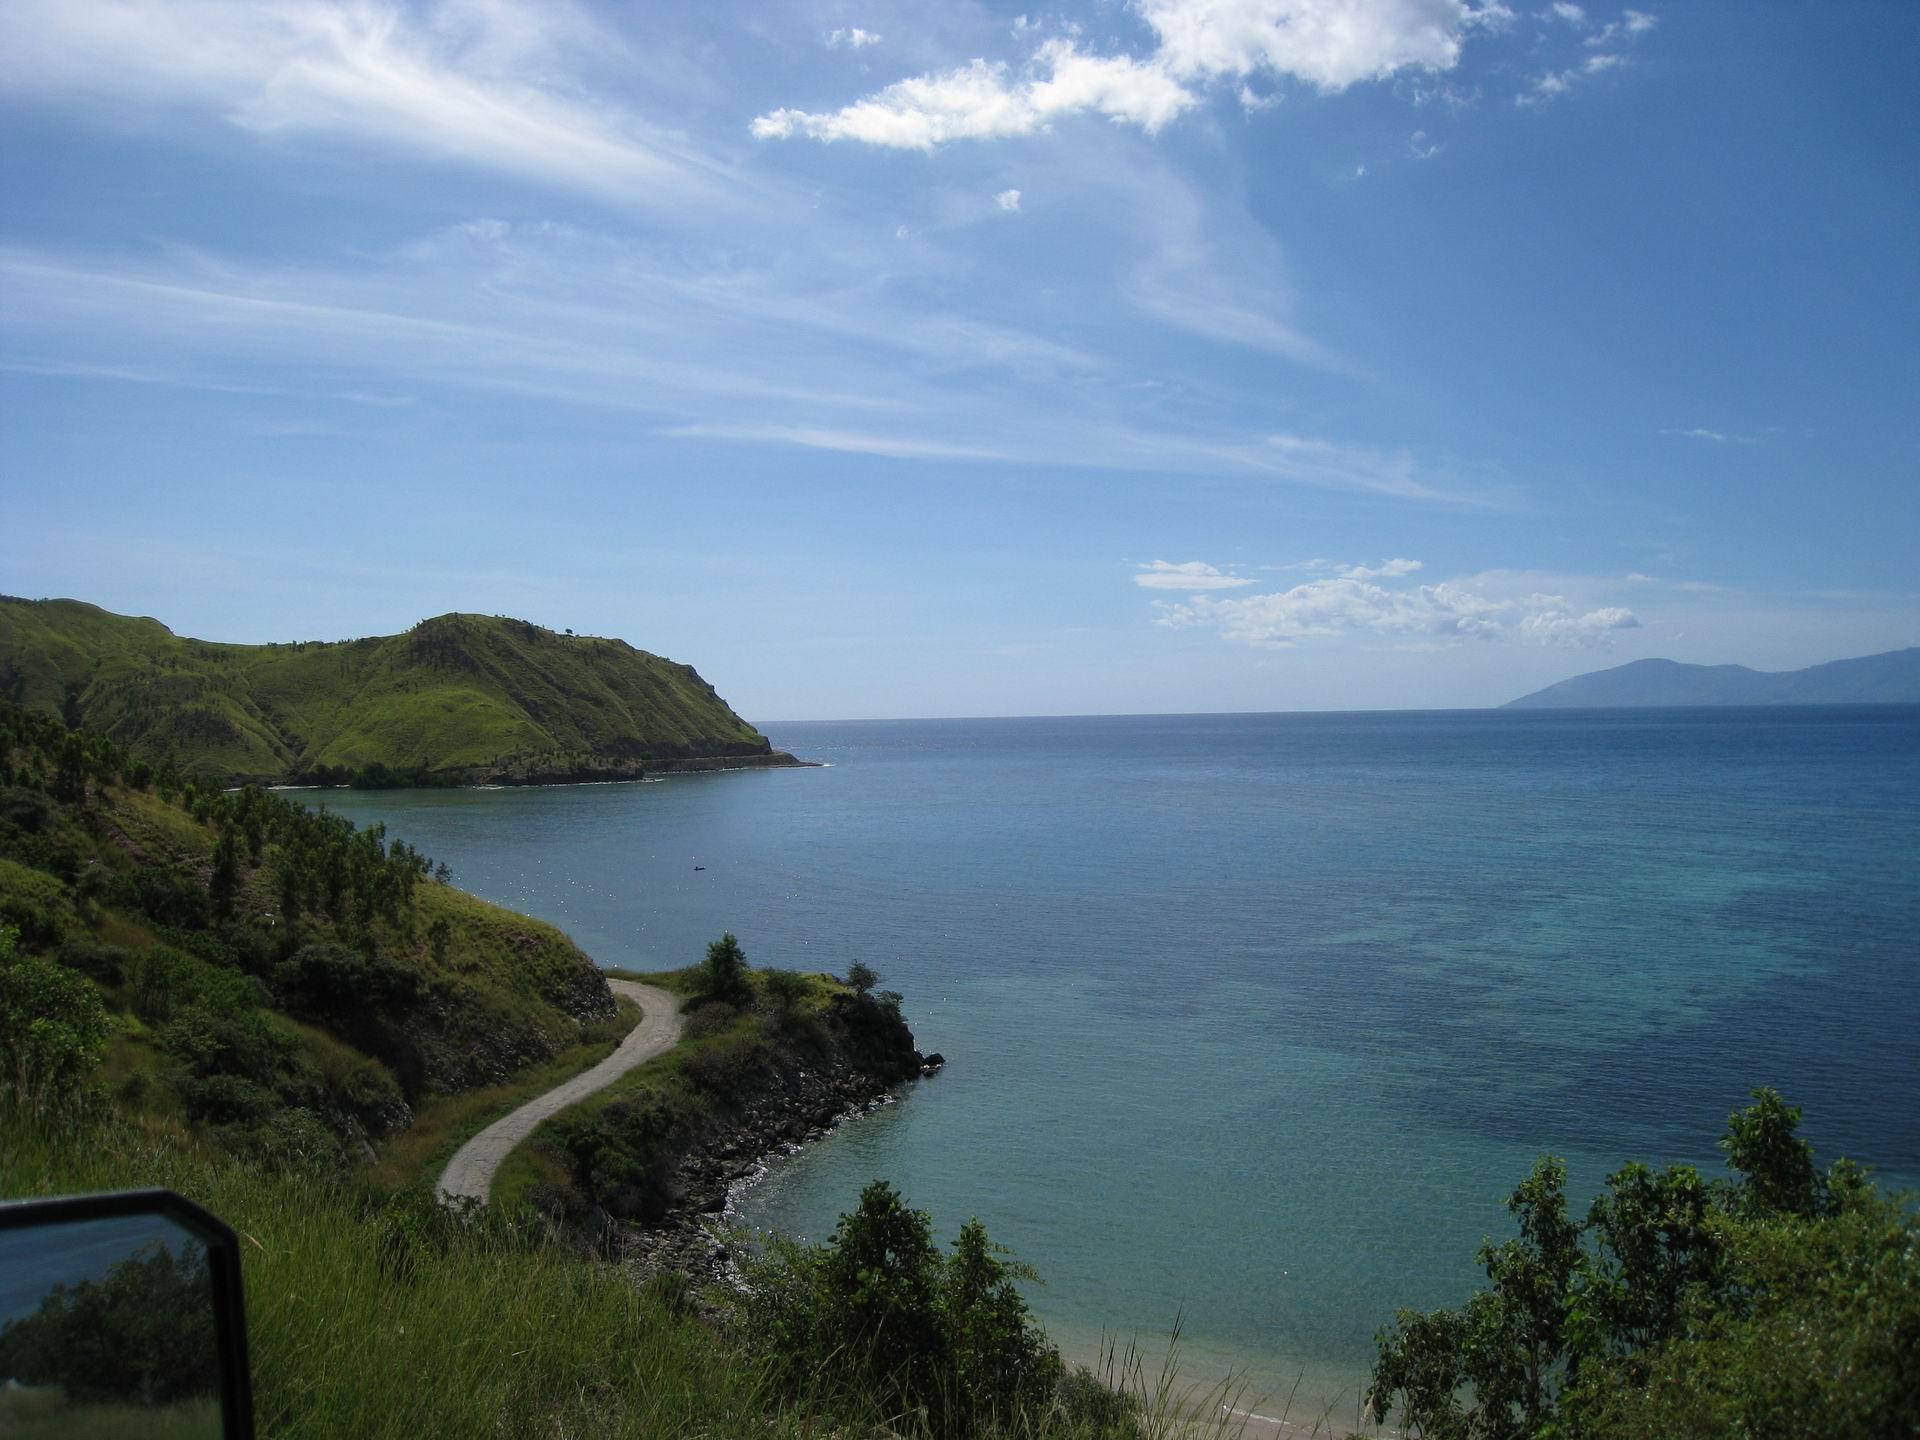 Maubara, East Timor